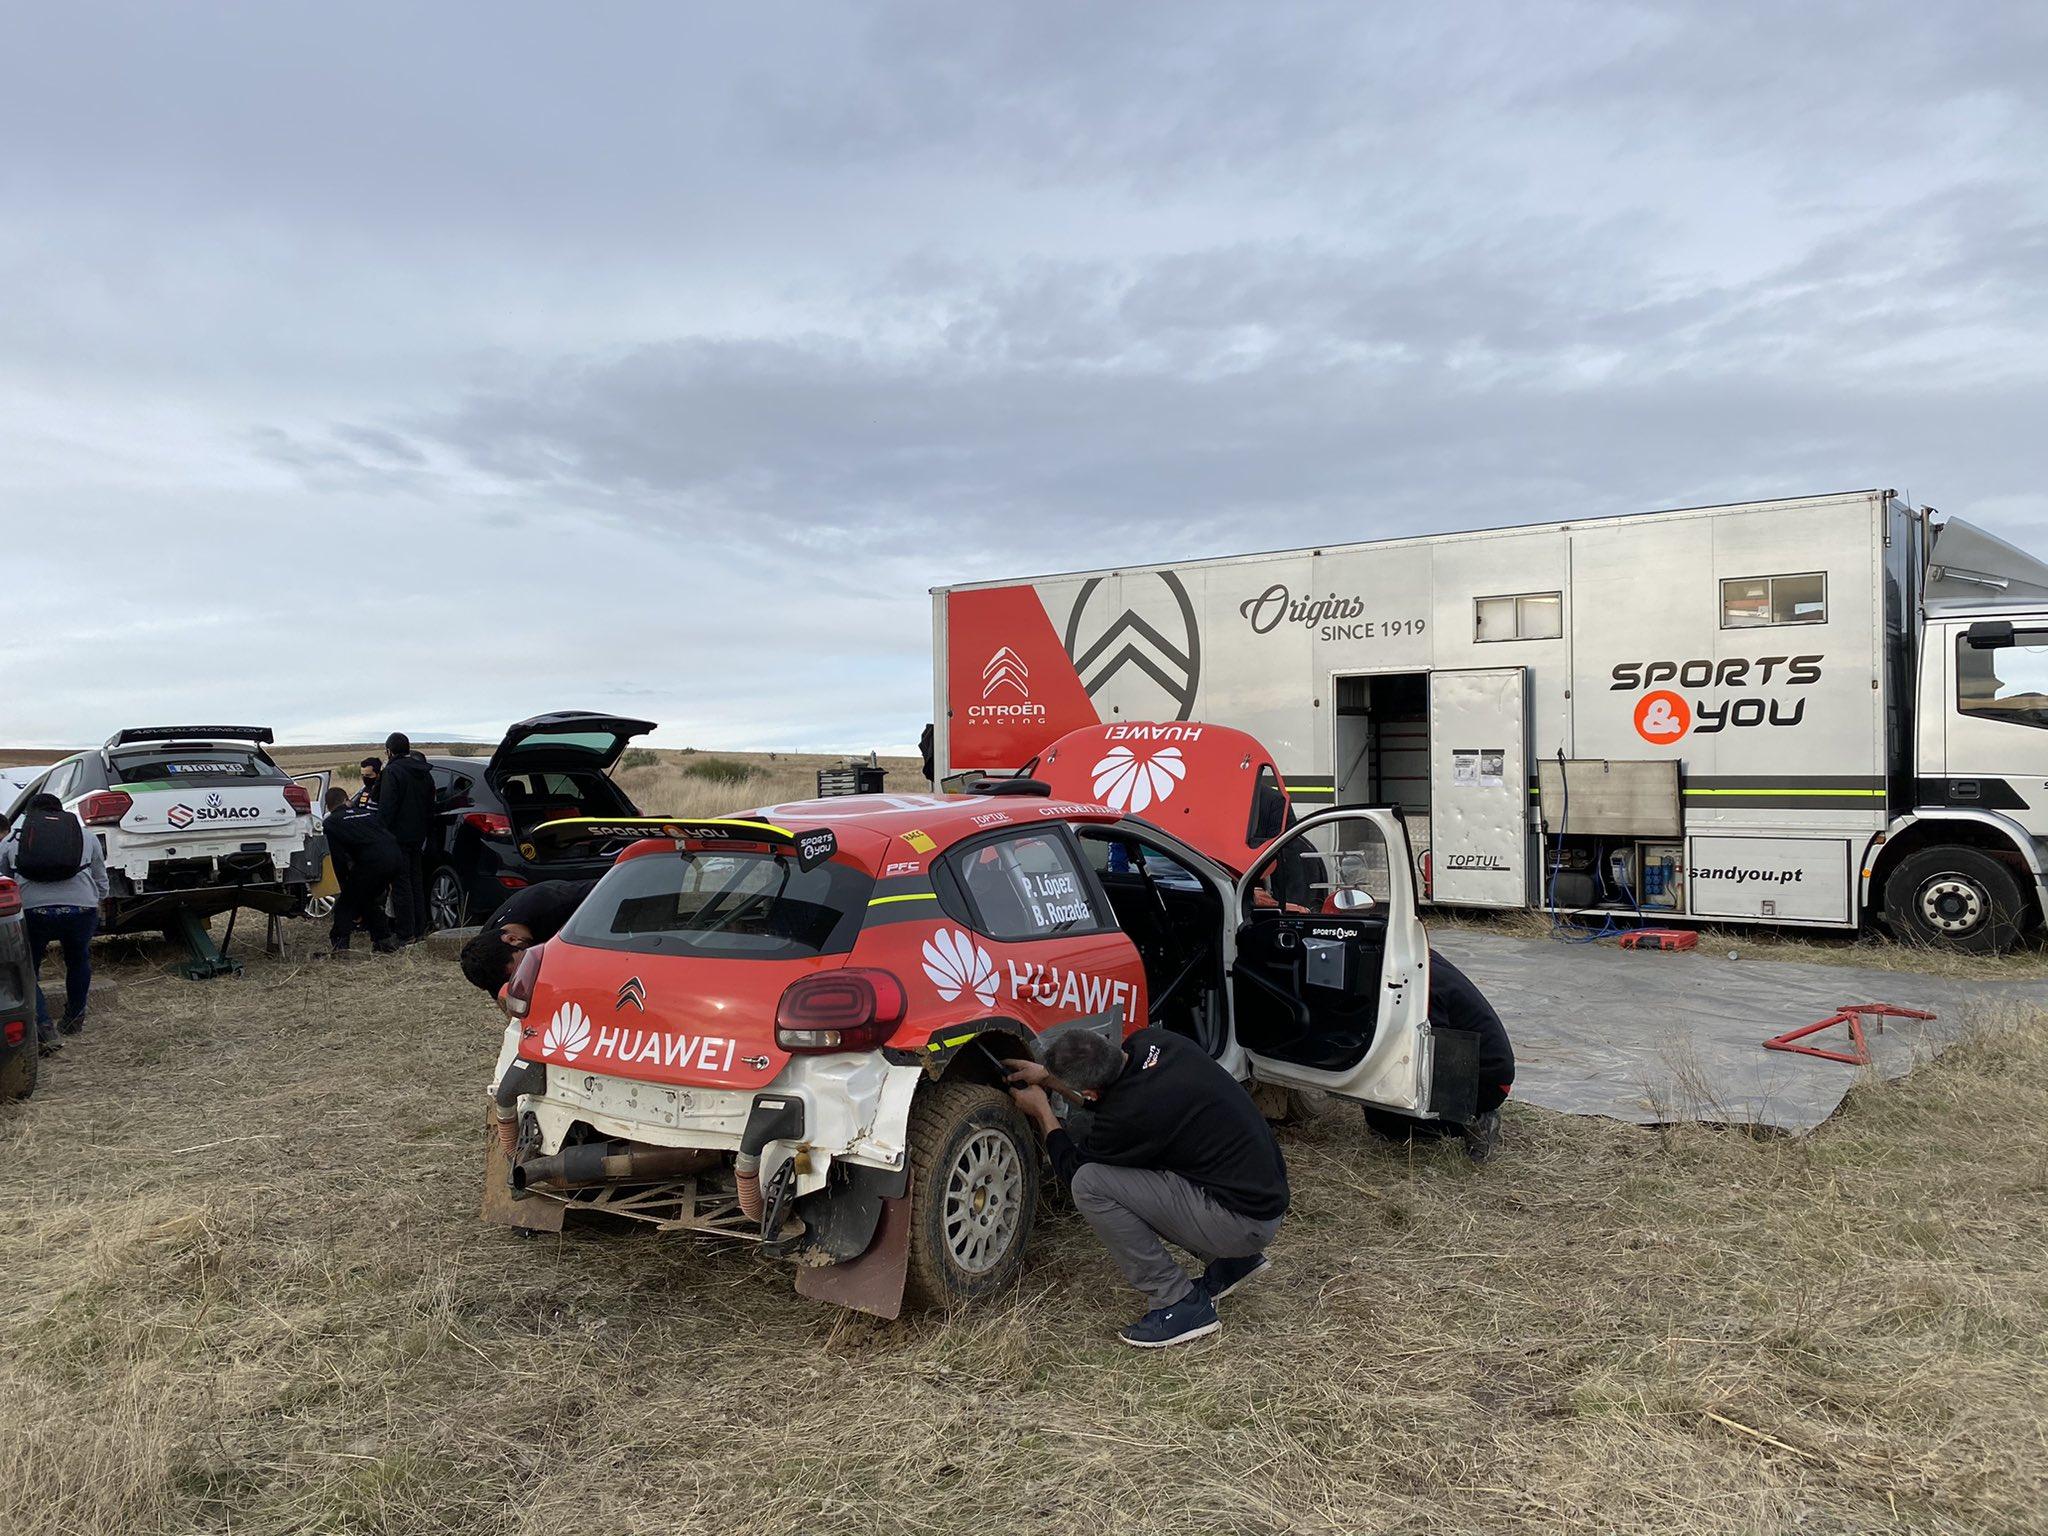 SCER + CERT: Rallye de Tierra de Madrid [13-14 Noviembre] - Página 2 EmpTIG_W8AEN7Rj?format=jpg&name=large